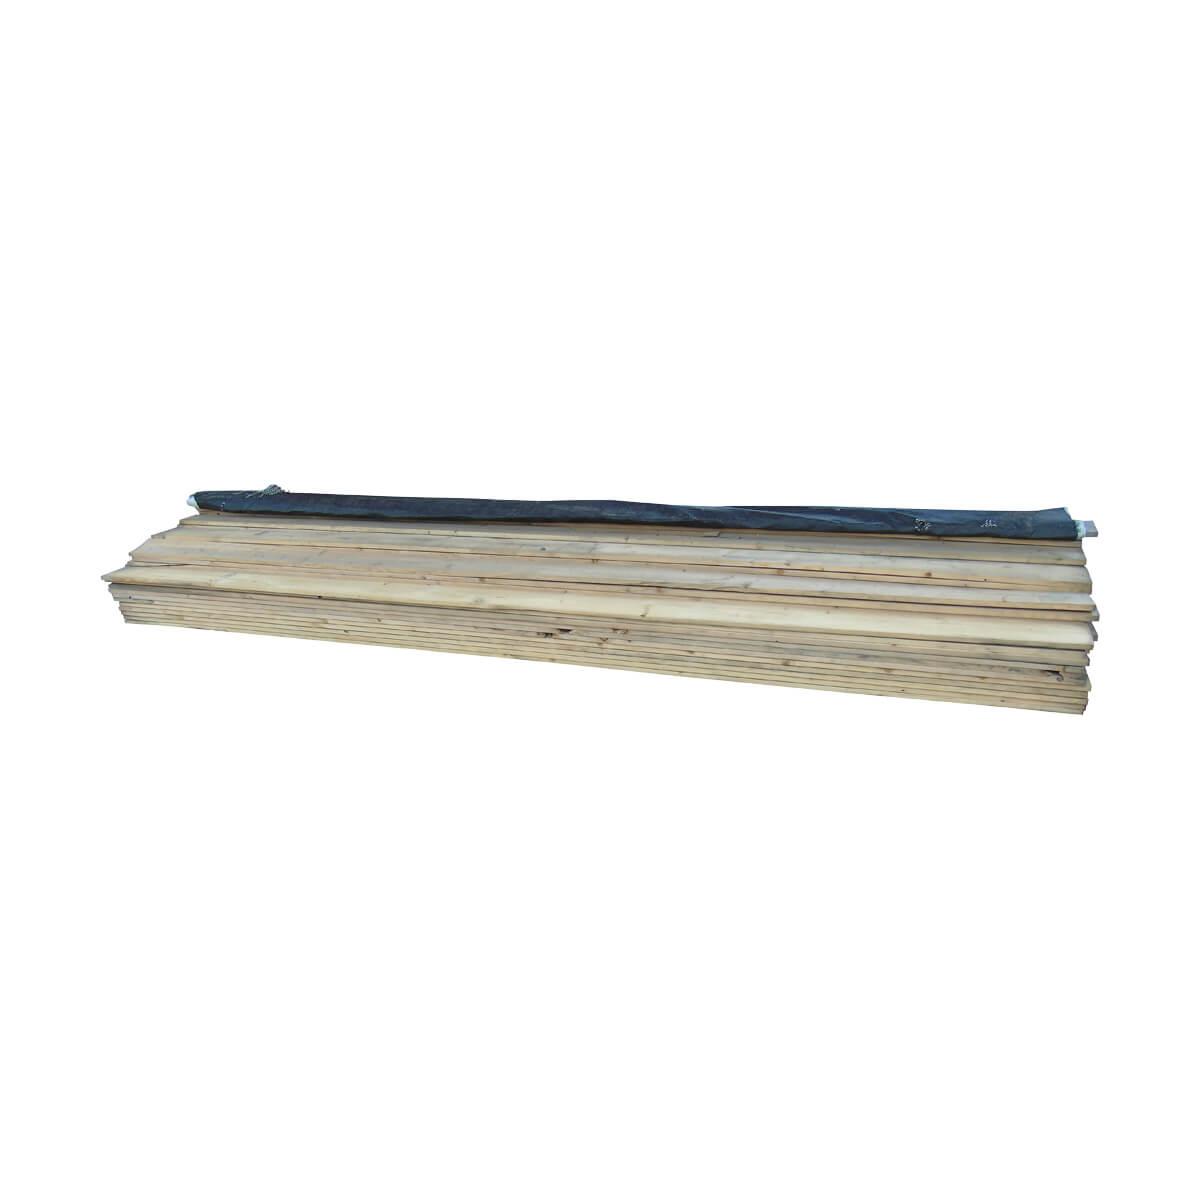 #3 Spruce Lumber - SPR #3 - 1 x 6 x 16-ft